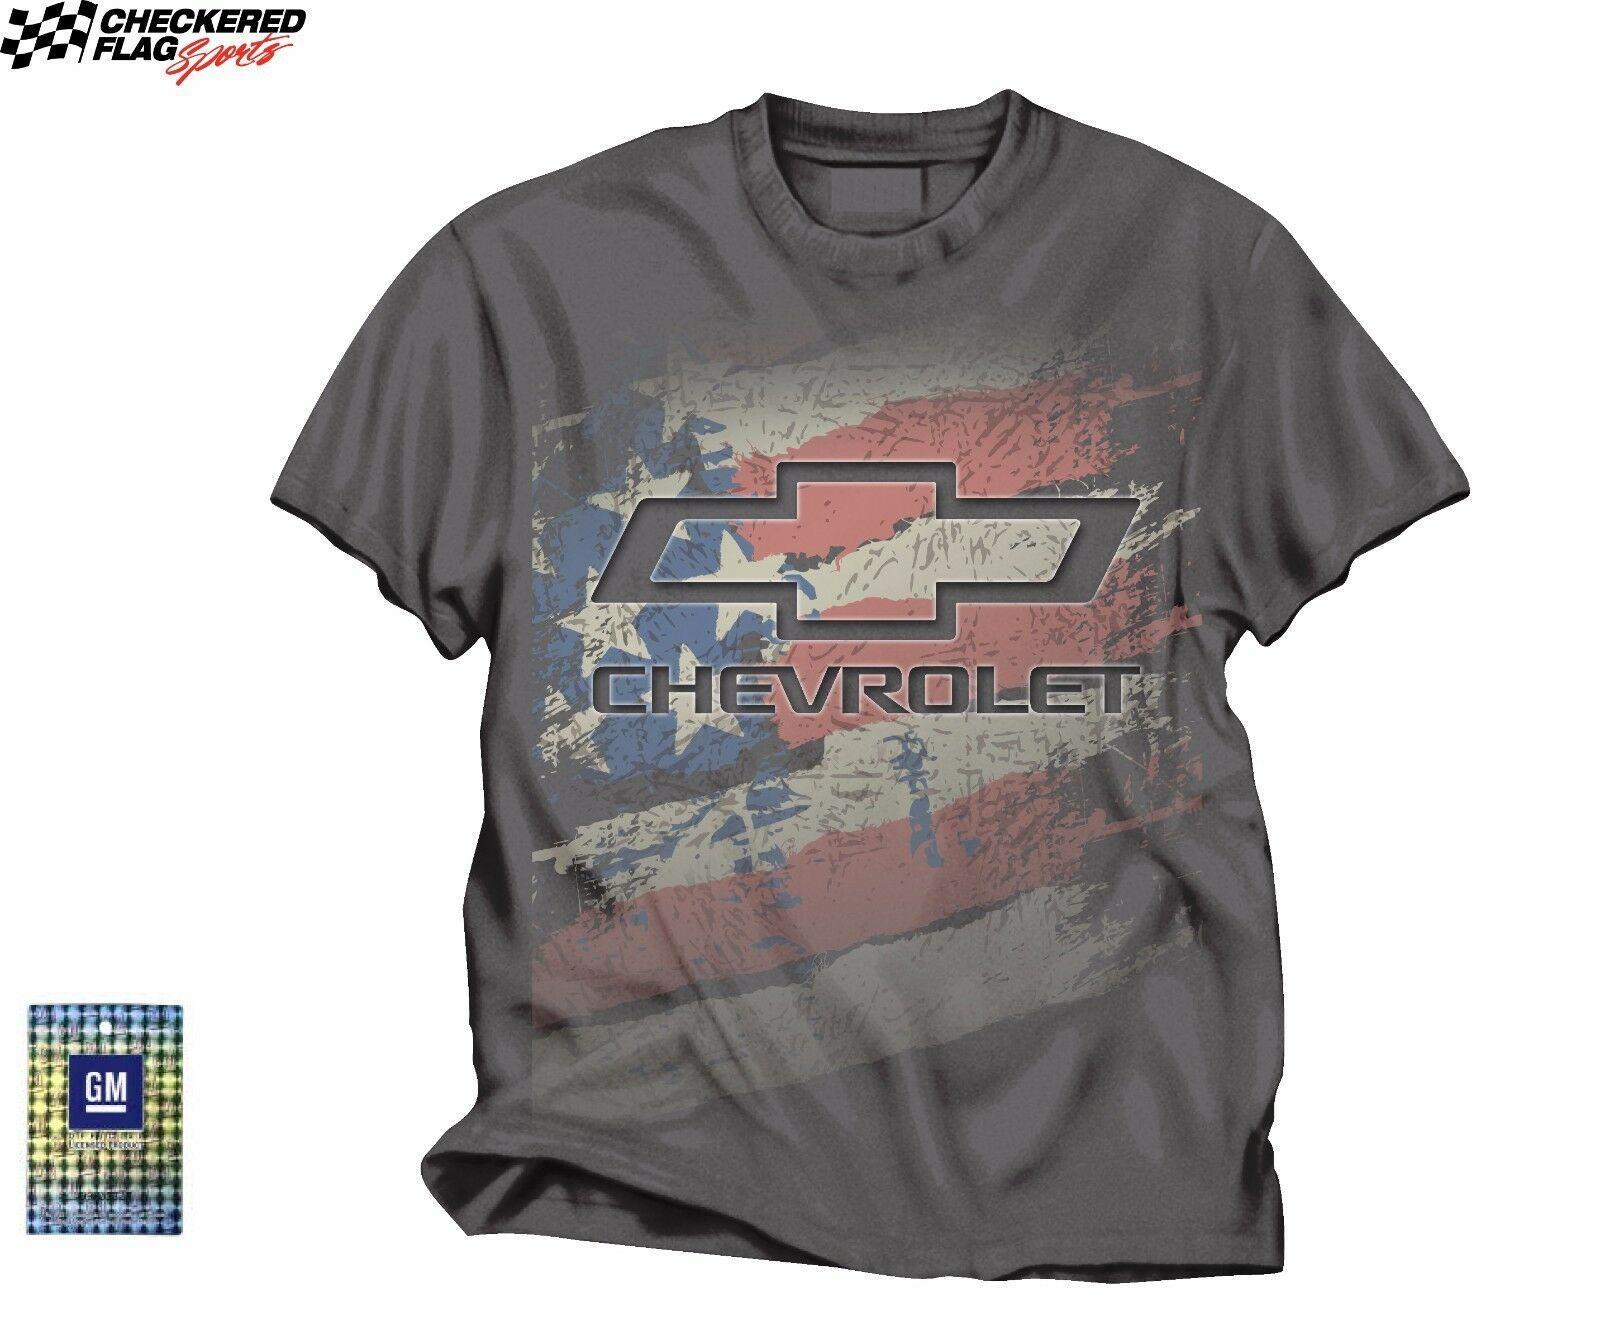 Chevrolet American Flag Men's Gray Tee Checkered Flag Sports -